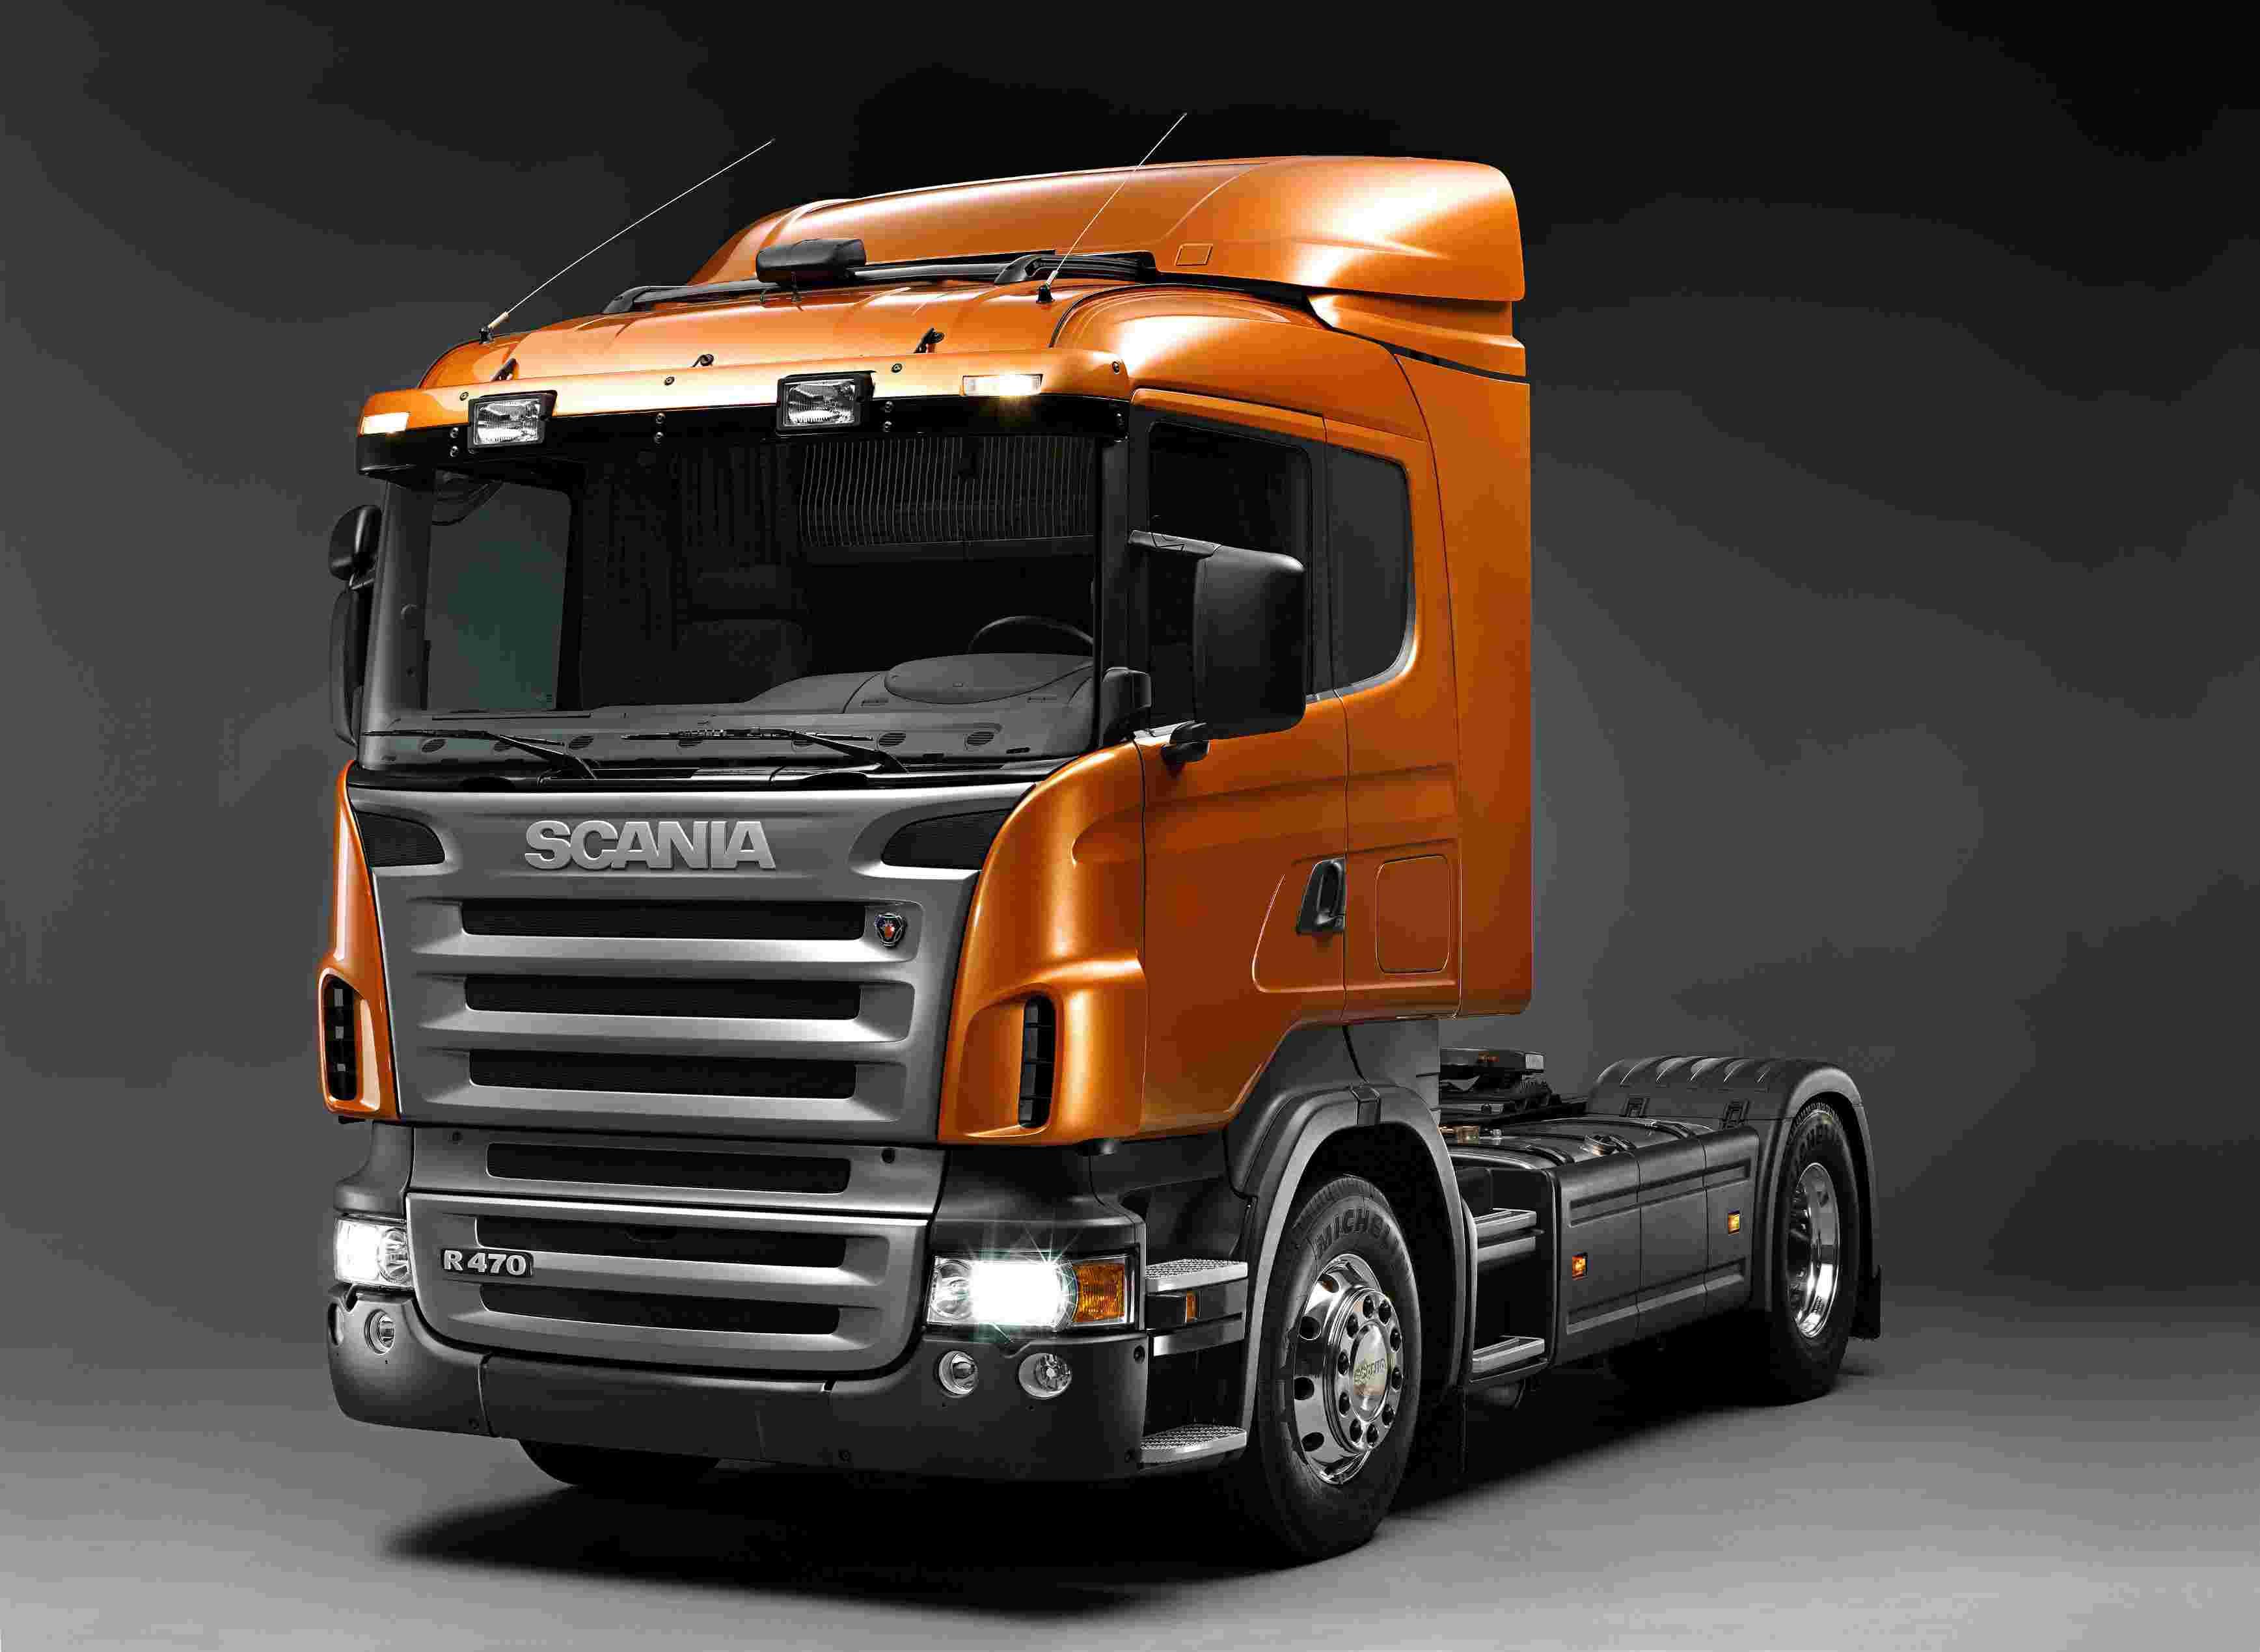 Scania Trucks Wallpapers Wallpaper Cave